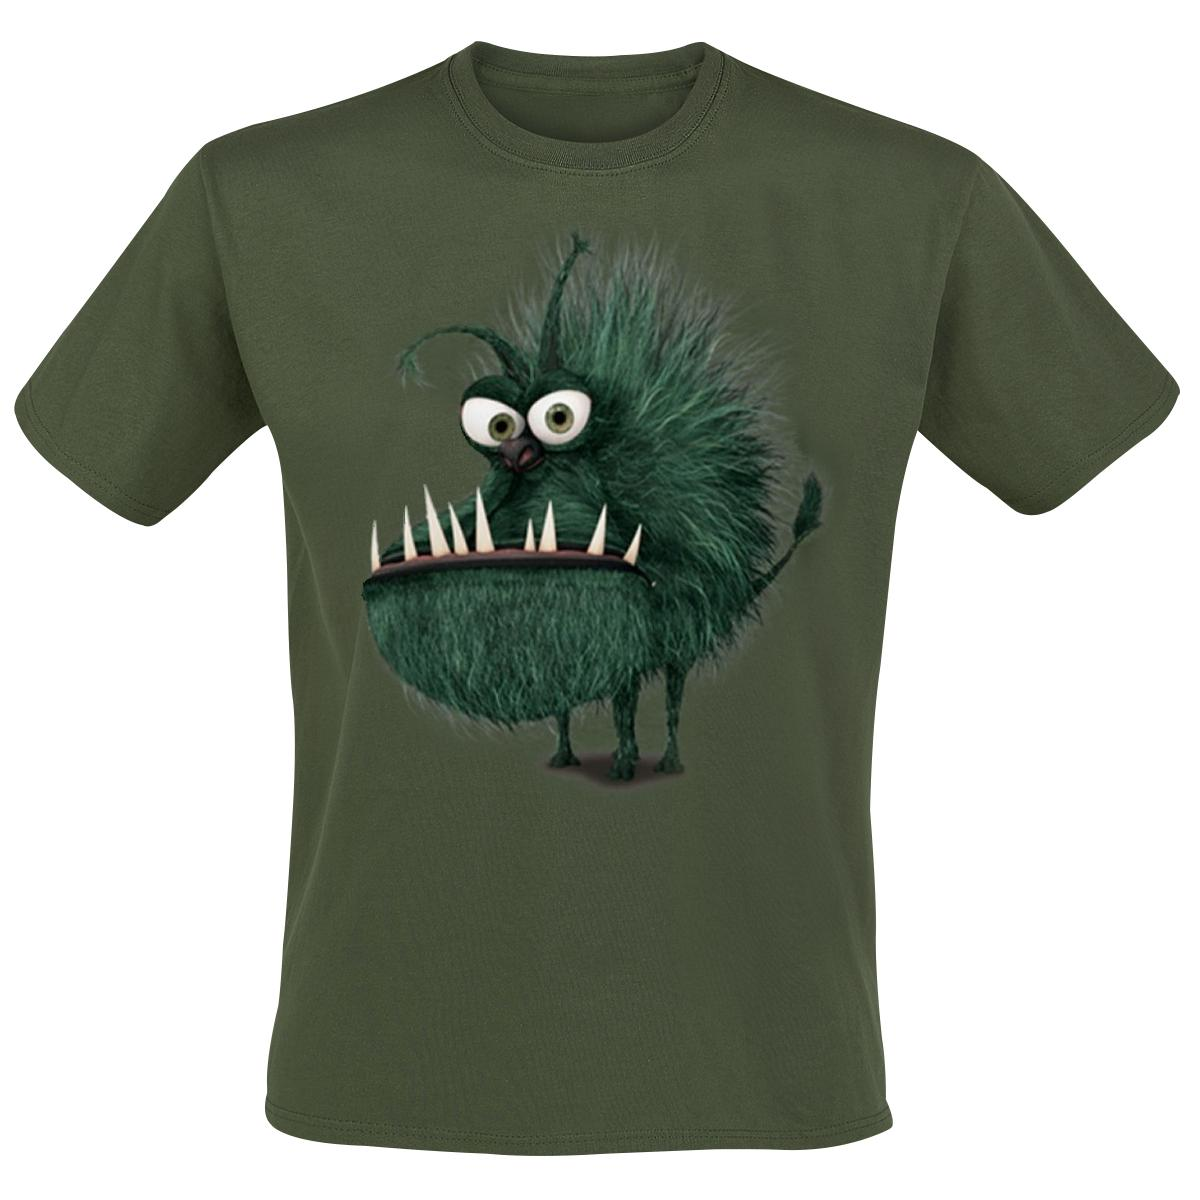 Kyle T-shirt Design tee